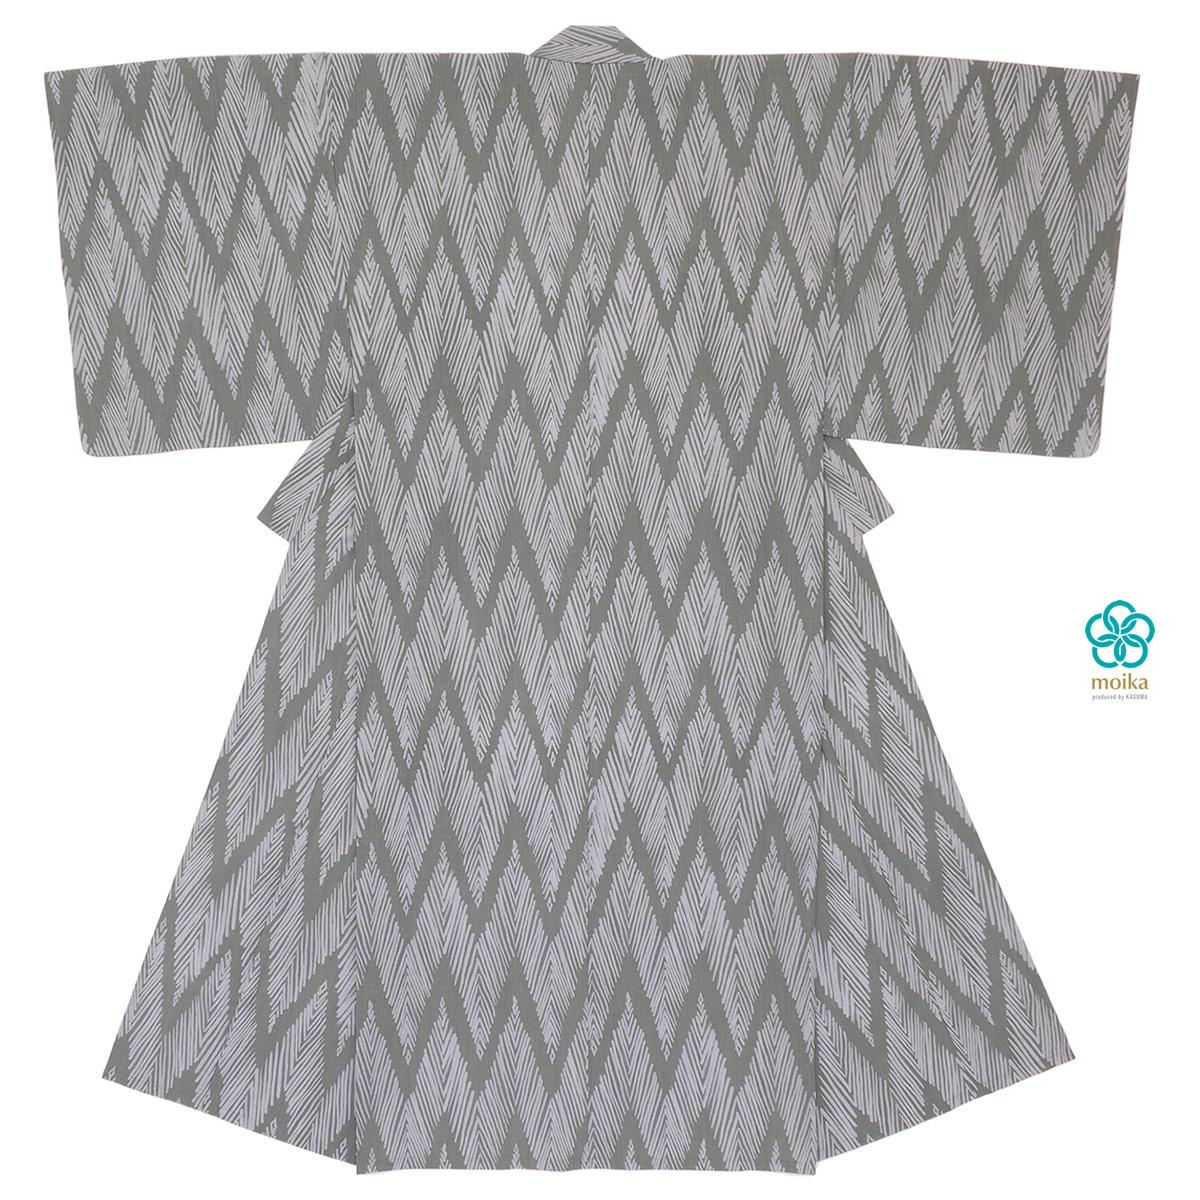 moika 浴衣 メンズ 単品 Mサイズ Lサイズ レトロ 大人 灰色 グレー 山脈縞 ヘリンボーン 男性用 仕立て上がり